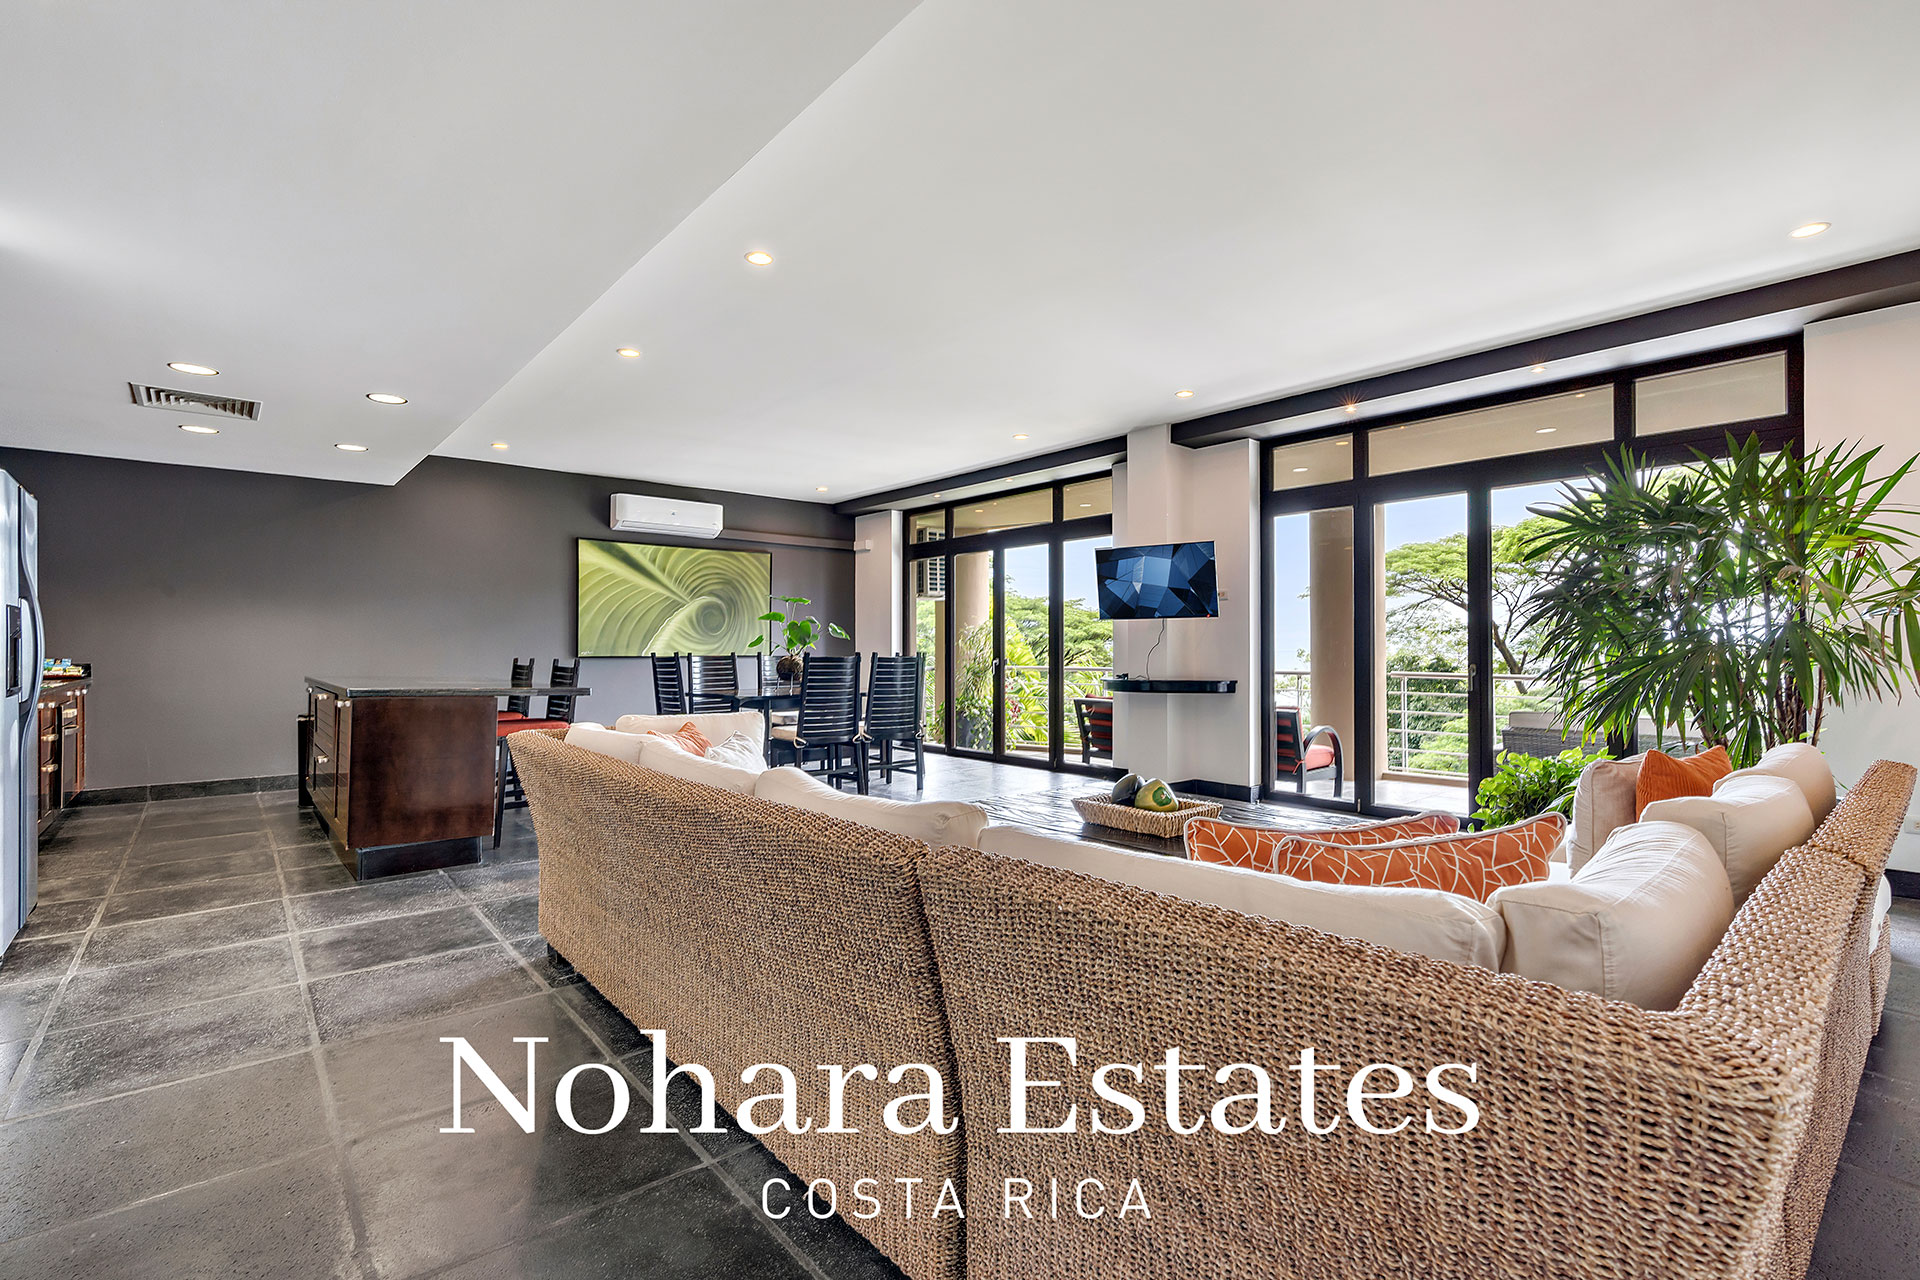 Nohara Estates Costa Rica 122 Apartment Quepos Los Altos 8